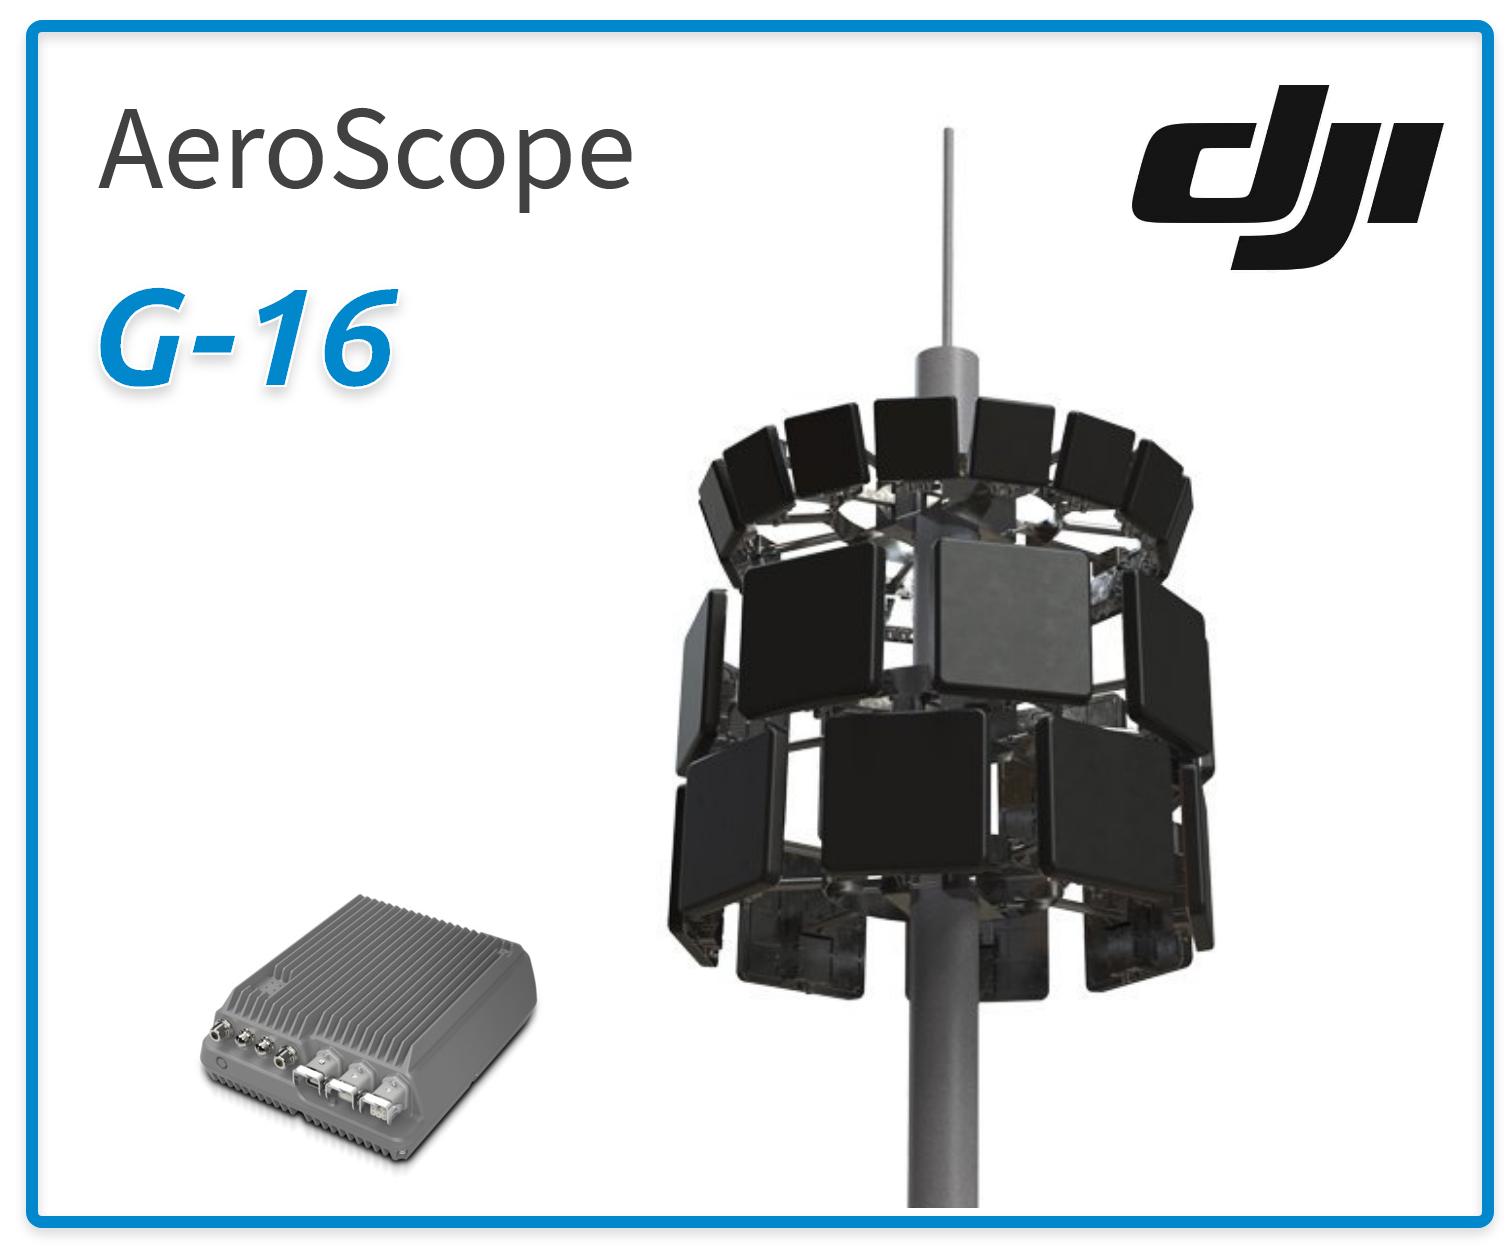 dji aeroscope g-16 drone detection antenna